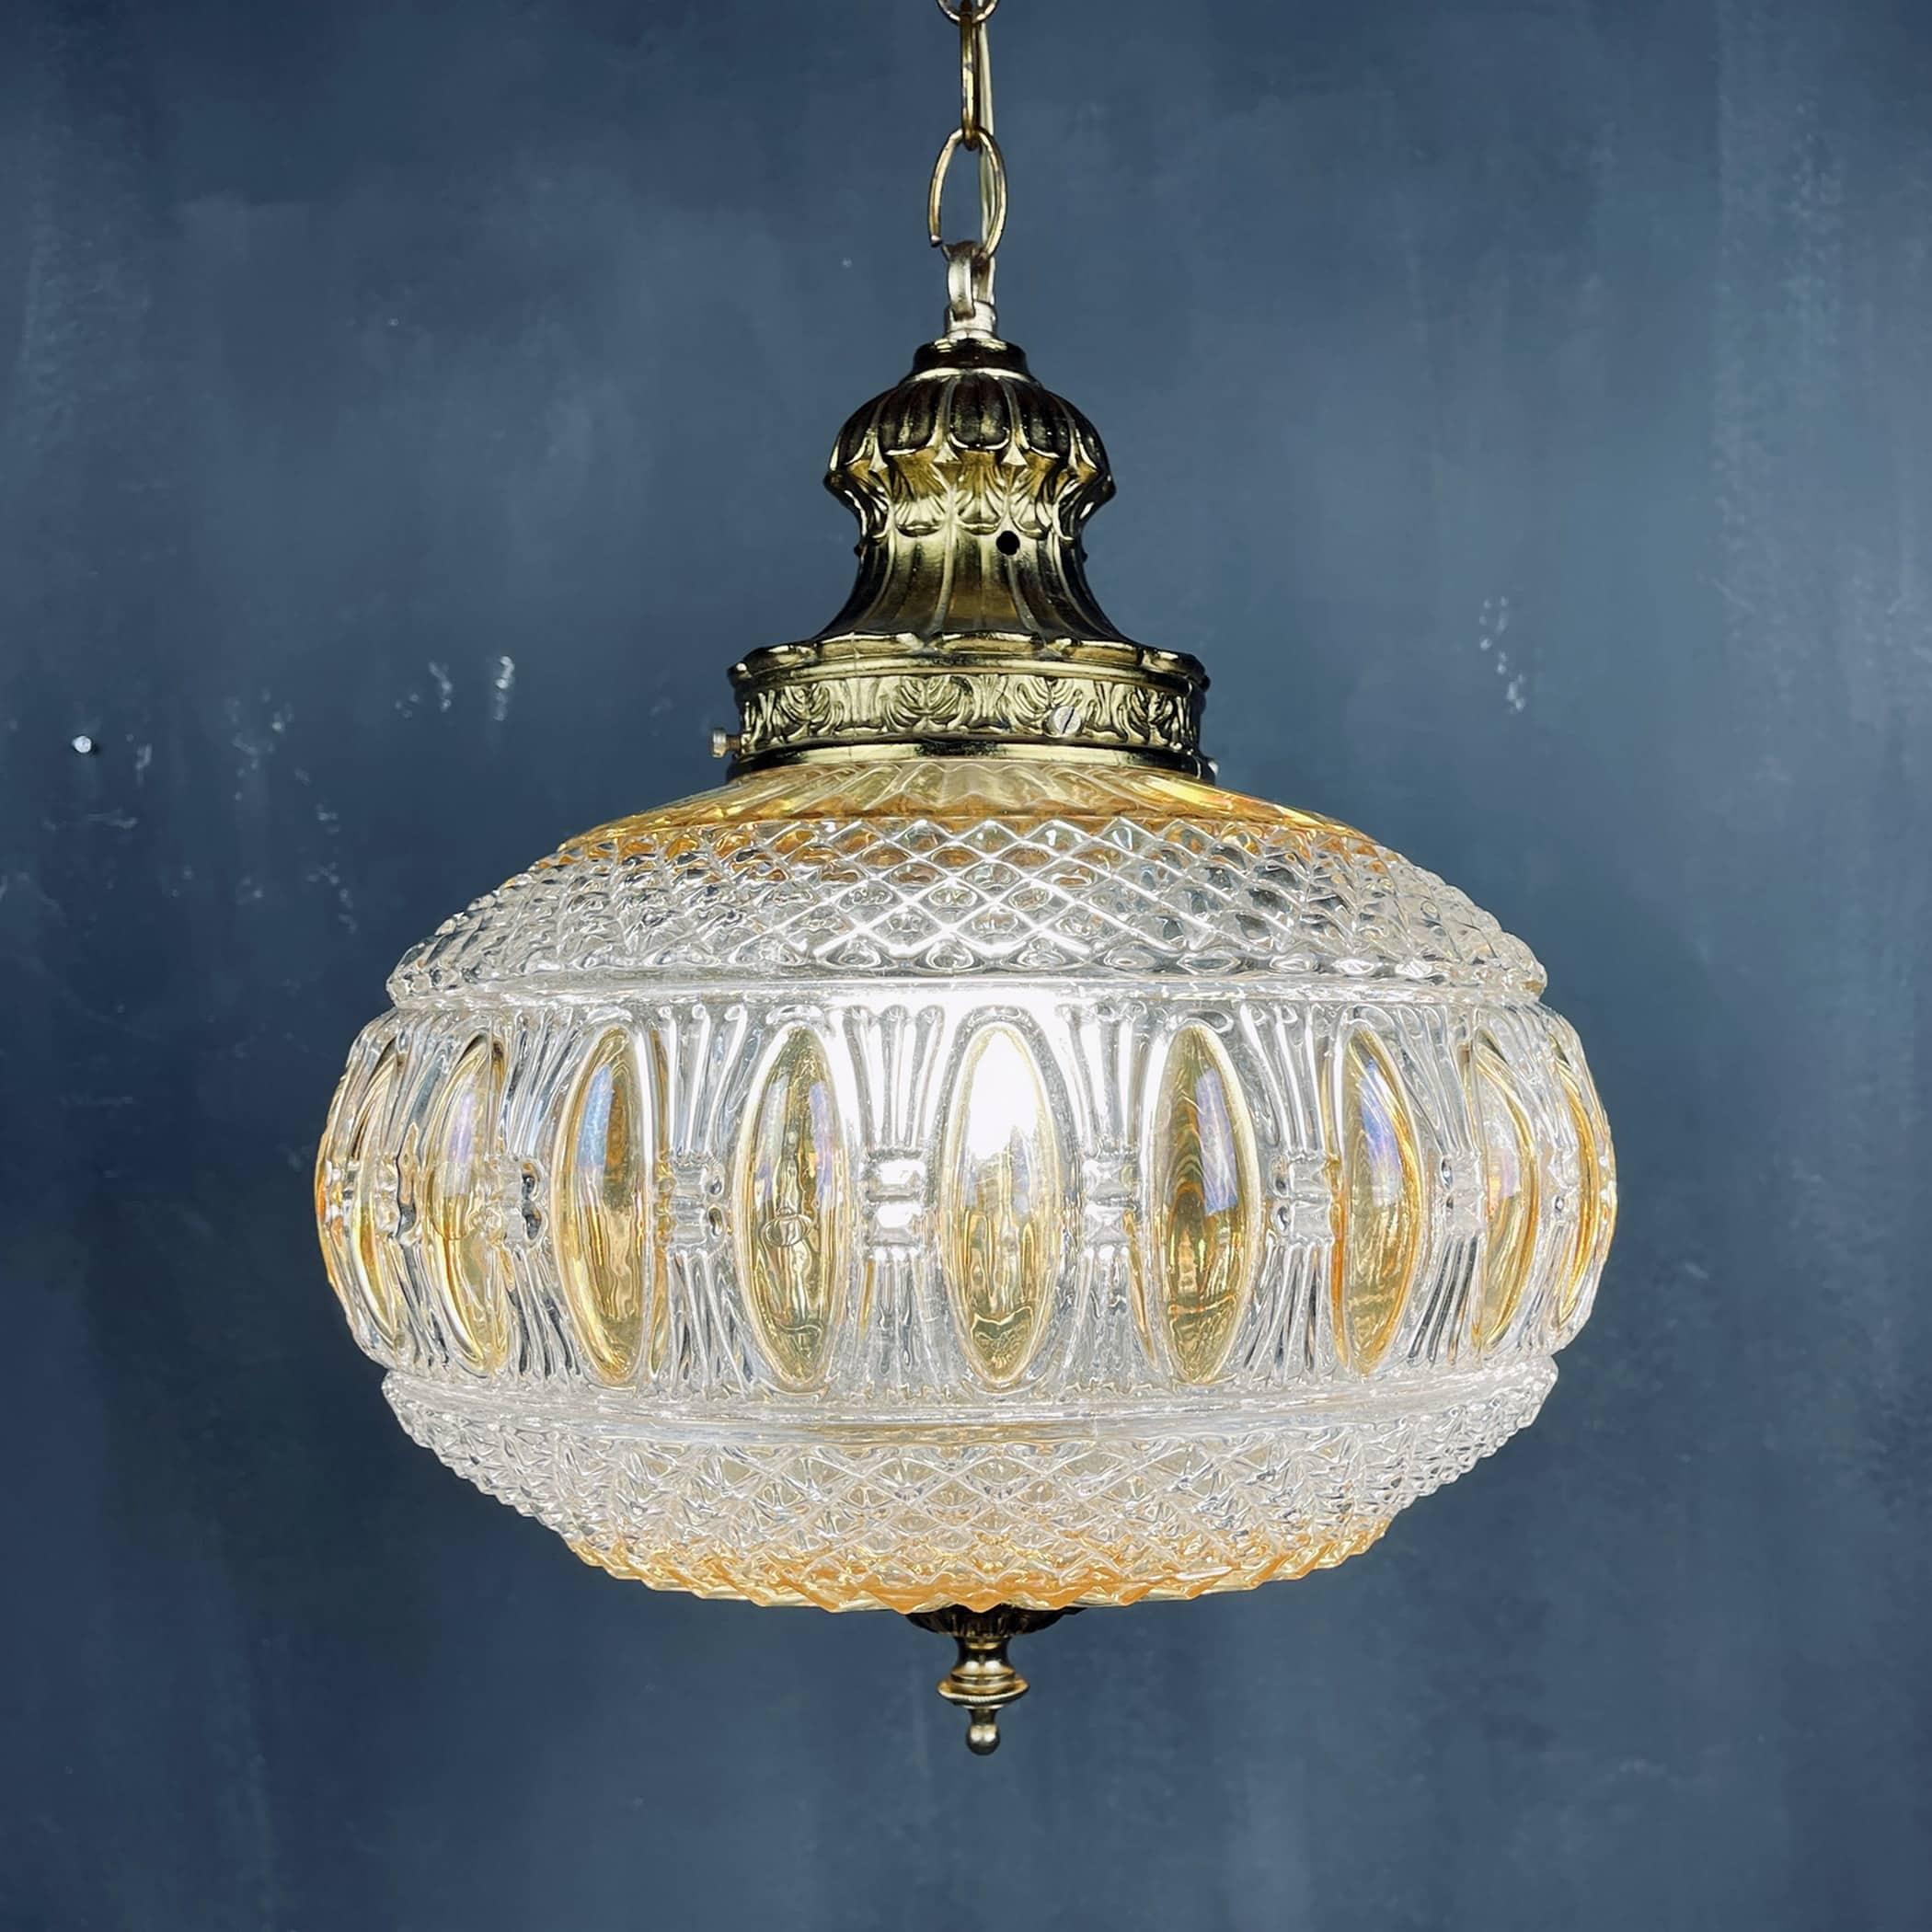 Vintage crystal swag lamp Italy 1970s Retro hanging lighting Mid-century bronze lamp